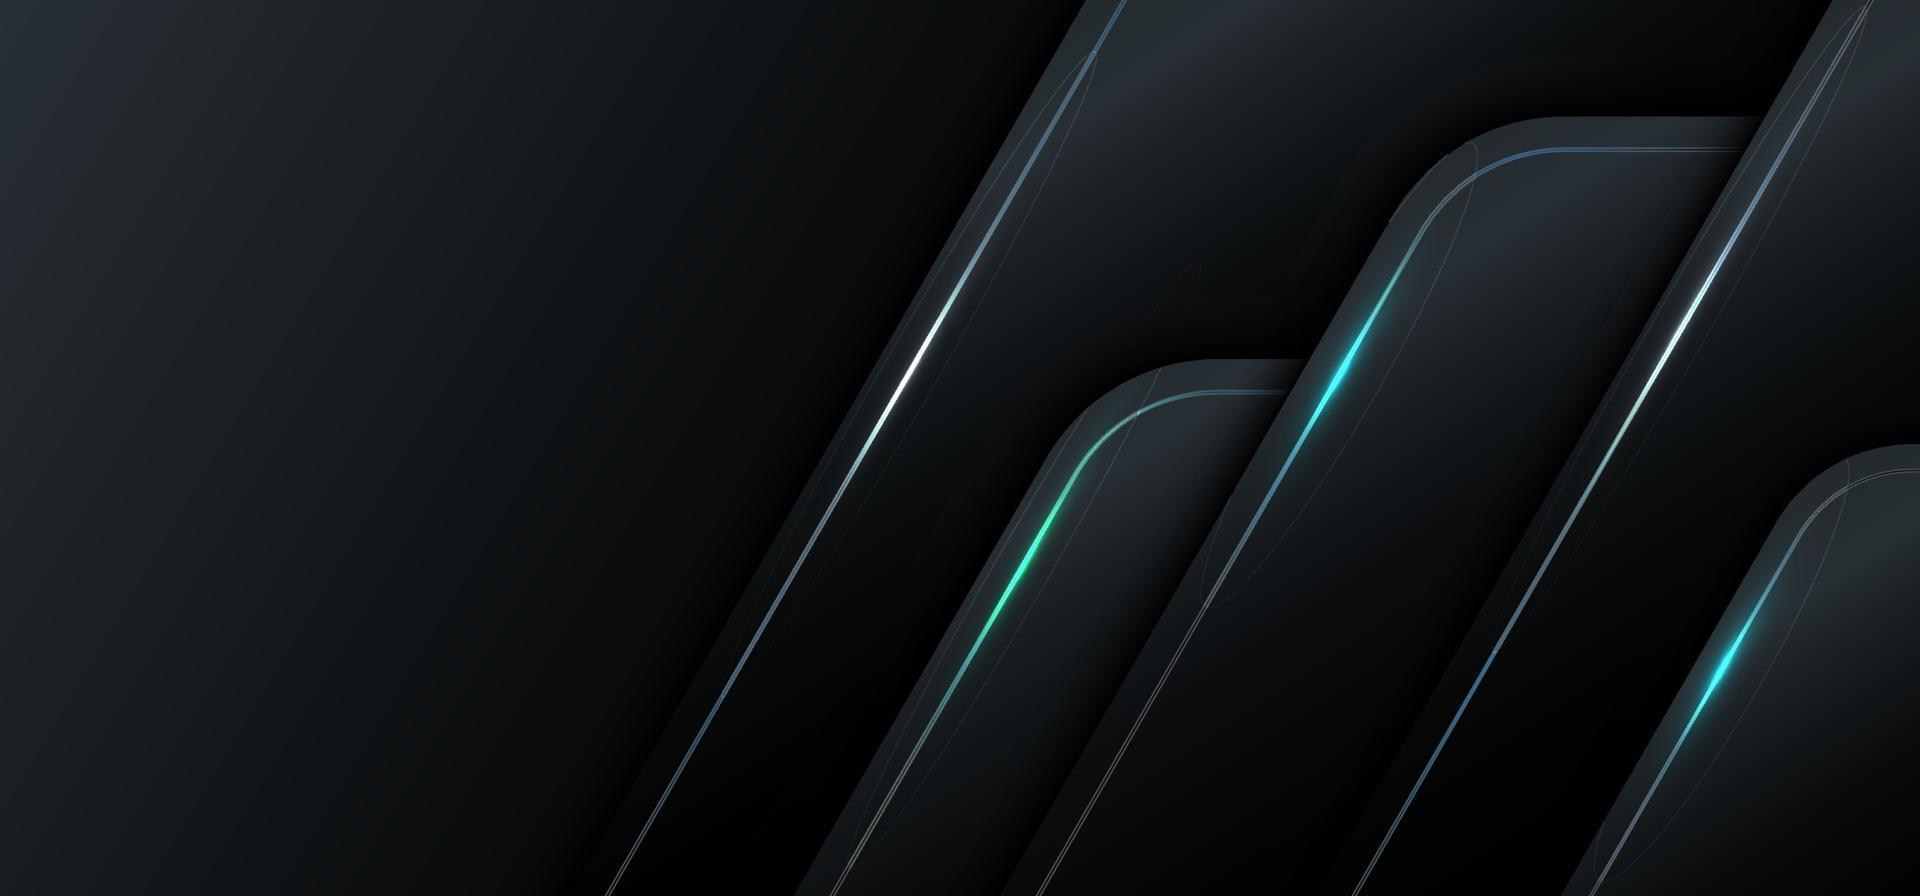 banner webbmall 3d geometrisk svart metallic med blått ljus teknik koncept. vektor